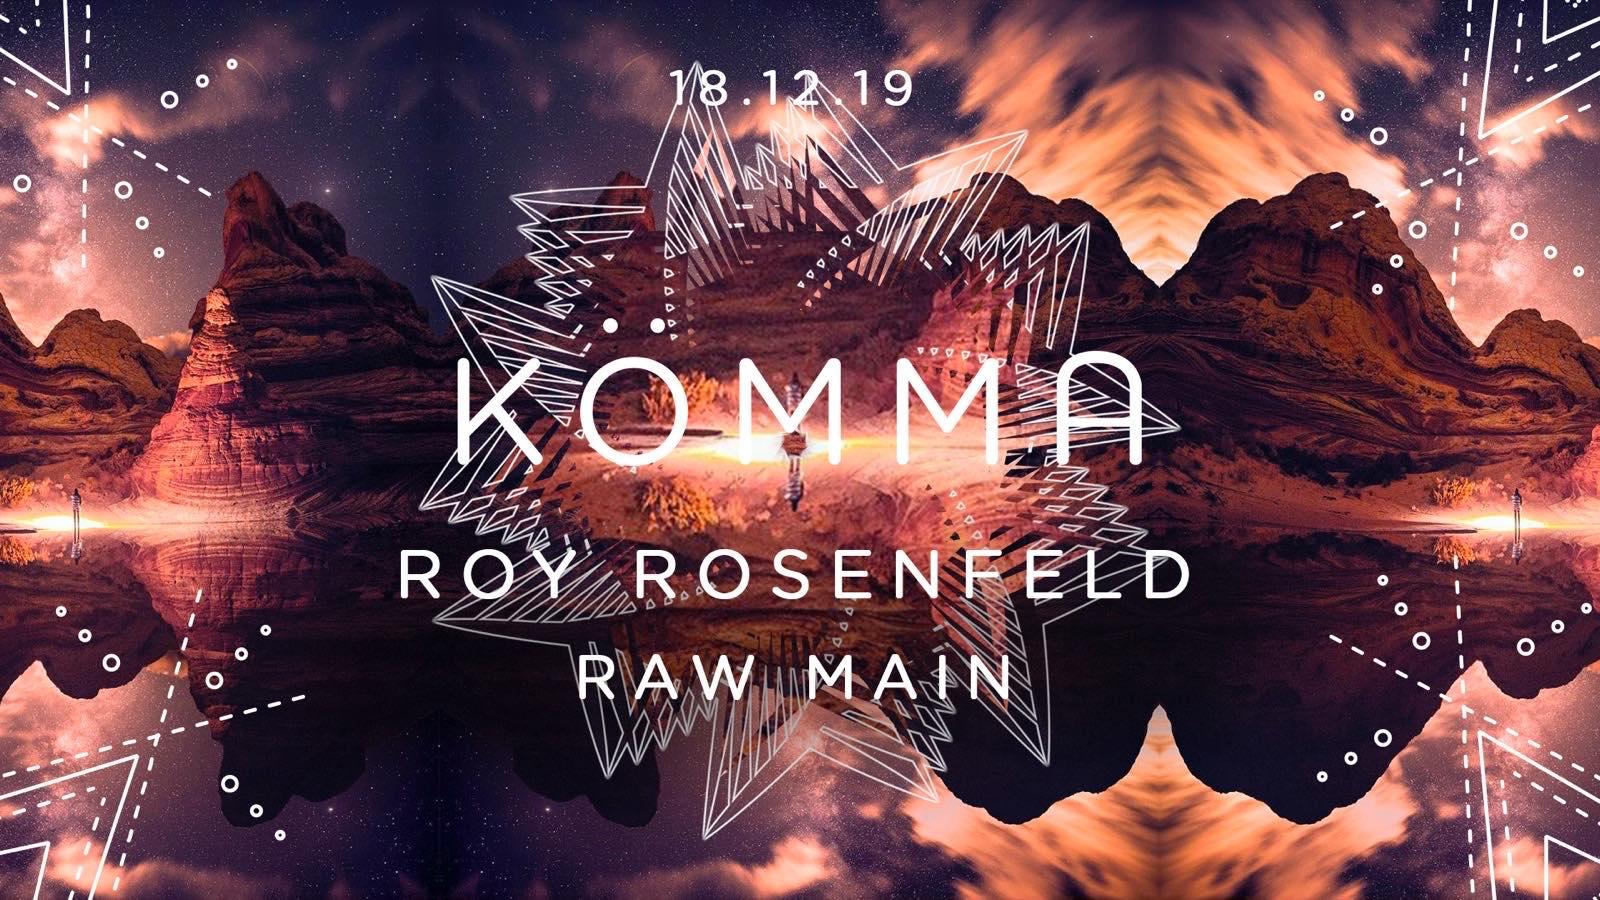 KÖMMA Paris + Roy Rosenfeld (All Day I Dream)